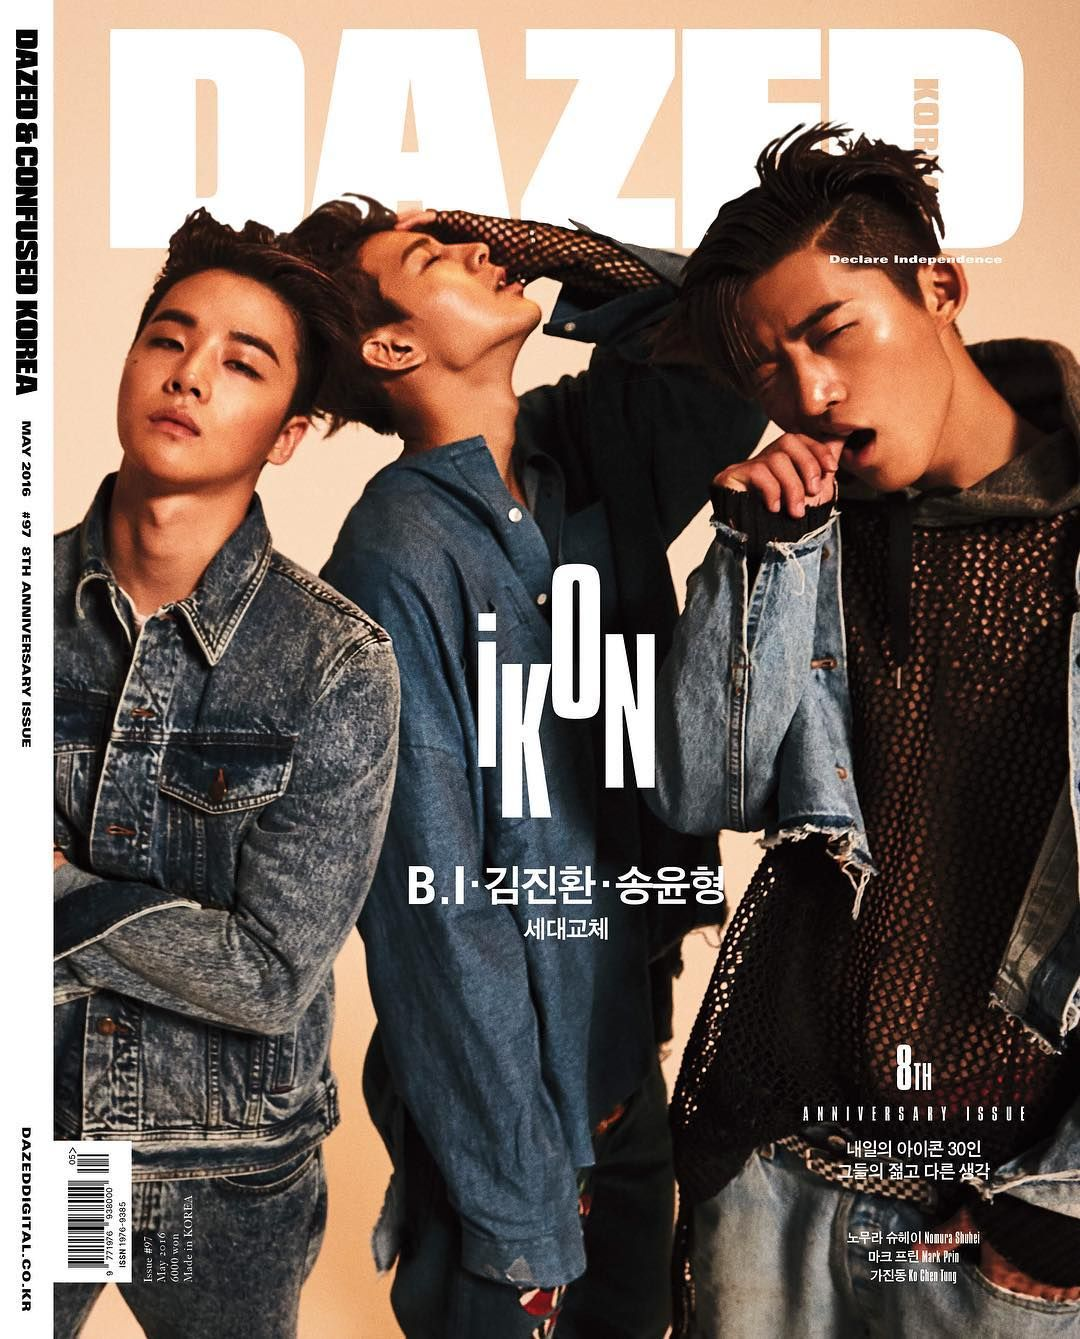 ikon-global:  Jinhwan, Yunhyeong & B.I for DAZED KOREA Magazine May Issue  © DAZED KOREA